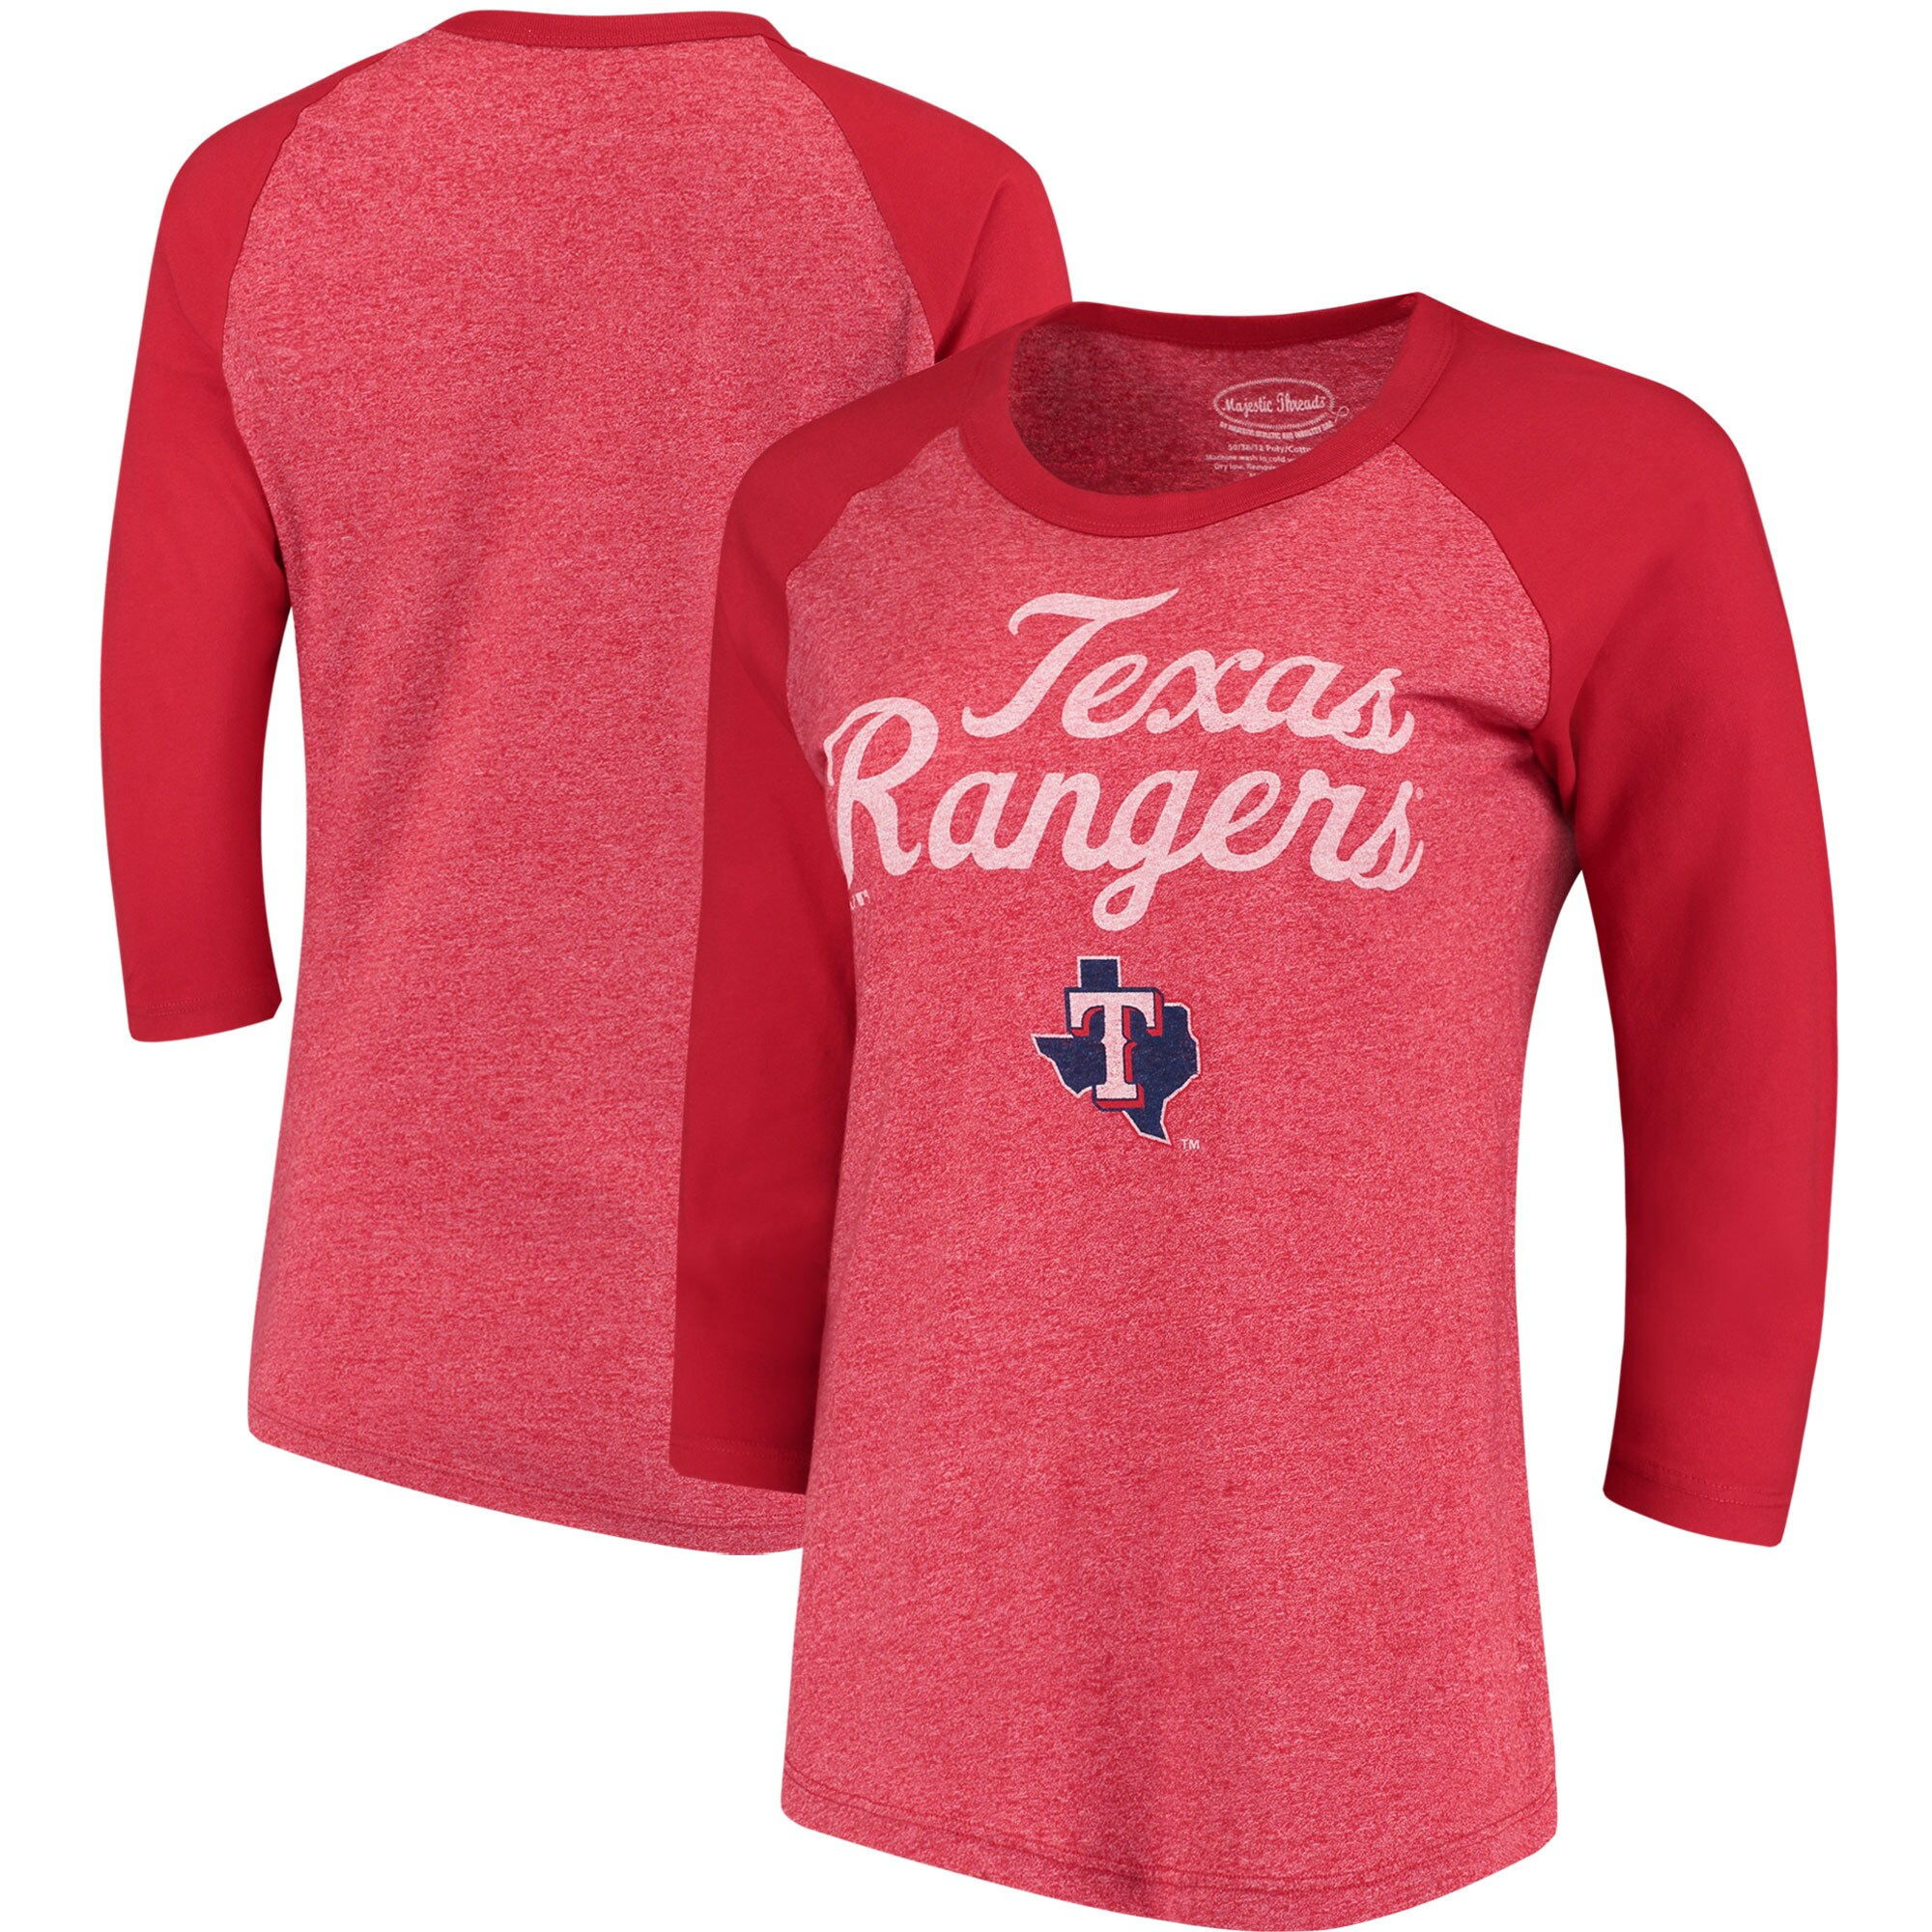 Texas Rangers Majestic Threads Women's 3/4-Sleeve Raglan T-Shirt - Red